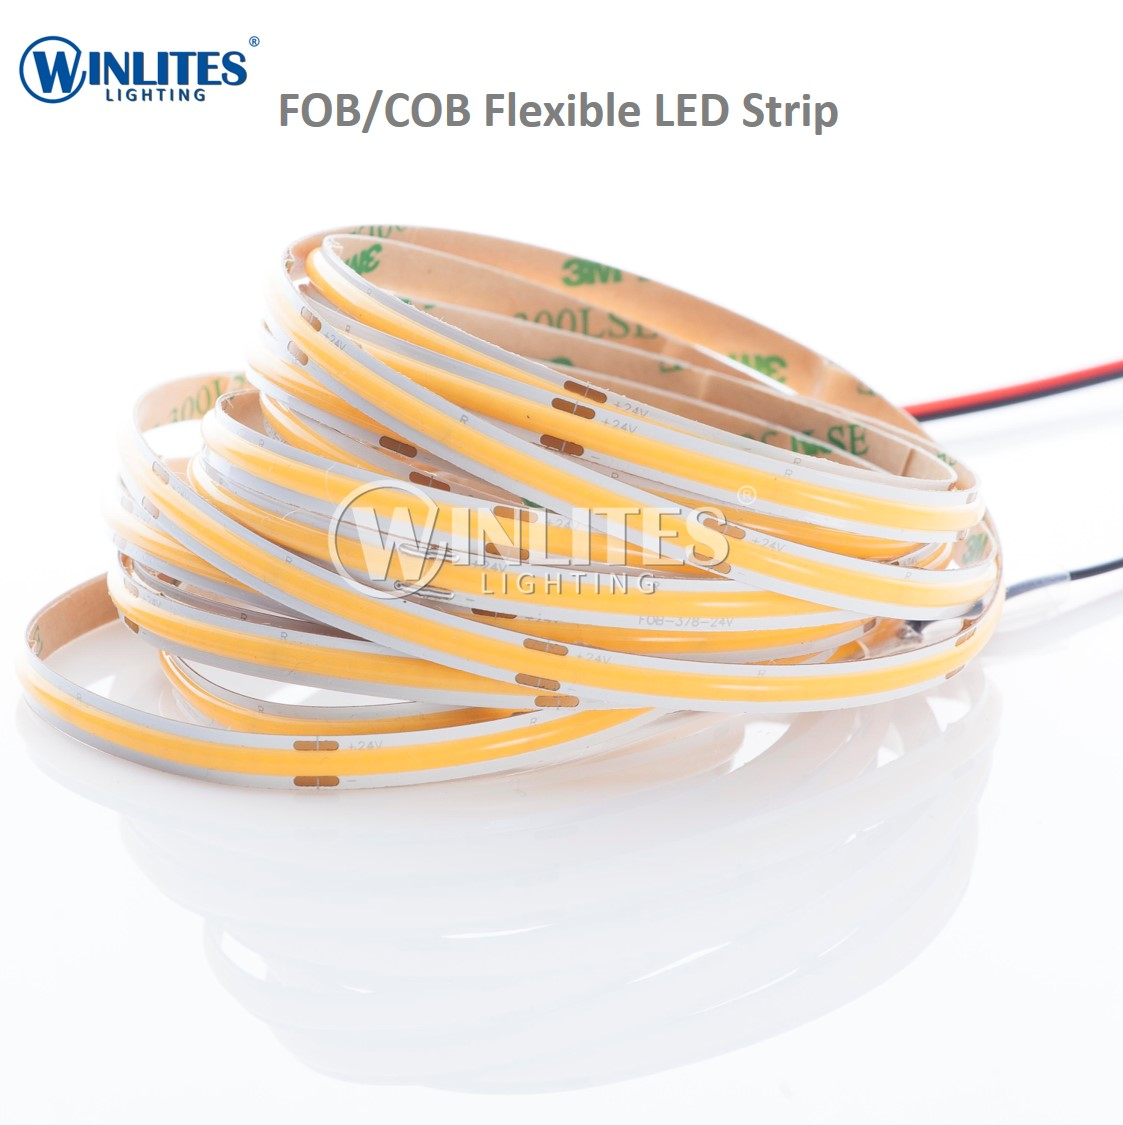 FOB/COB LED STRIP